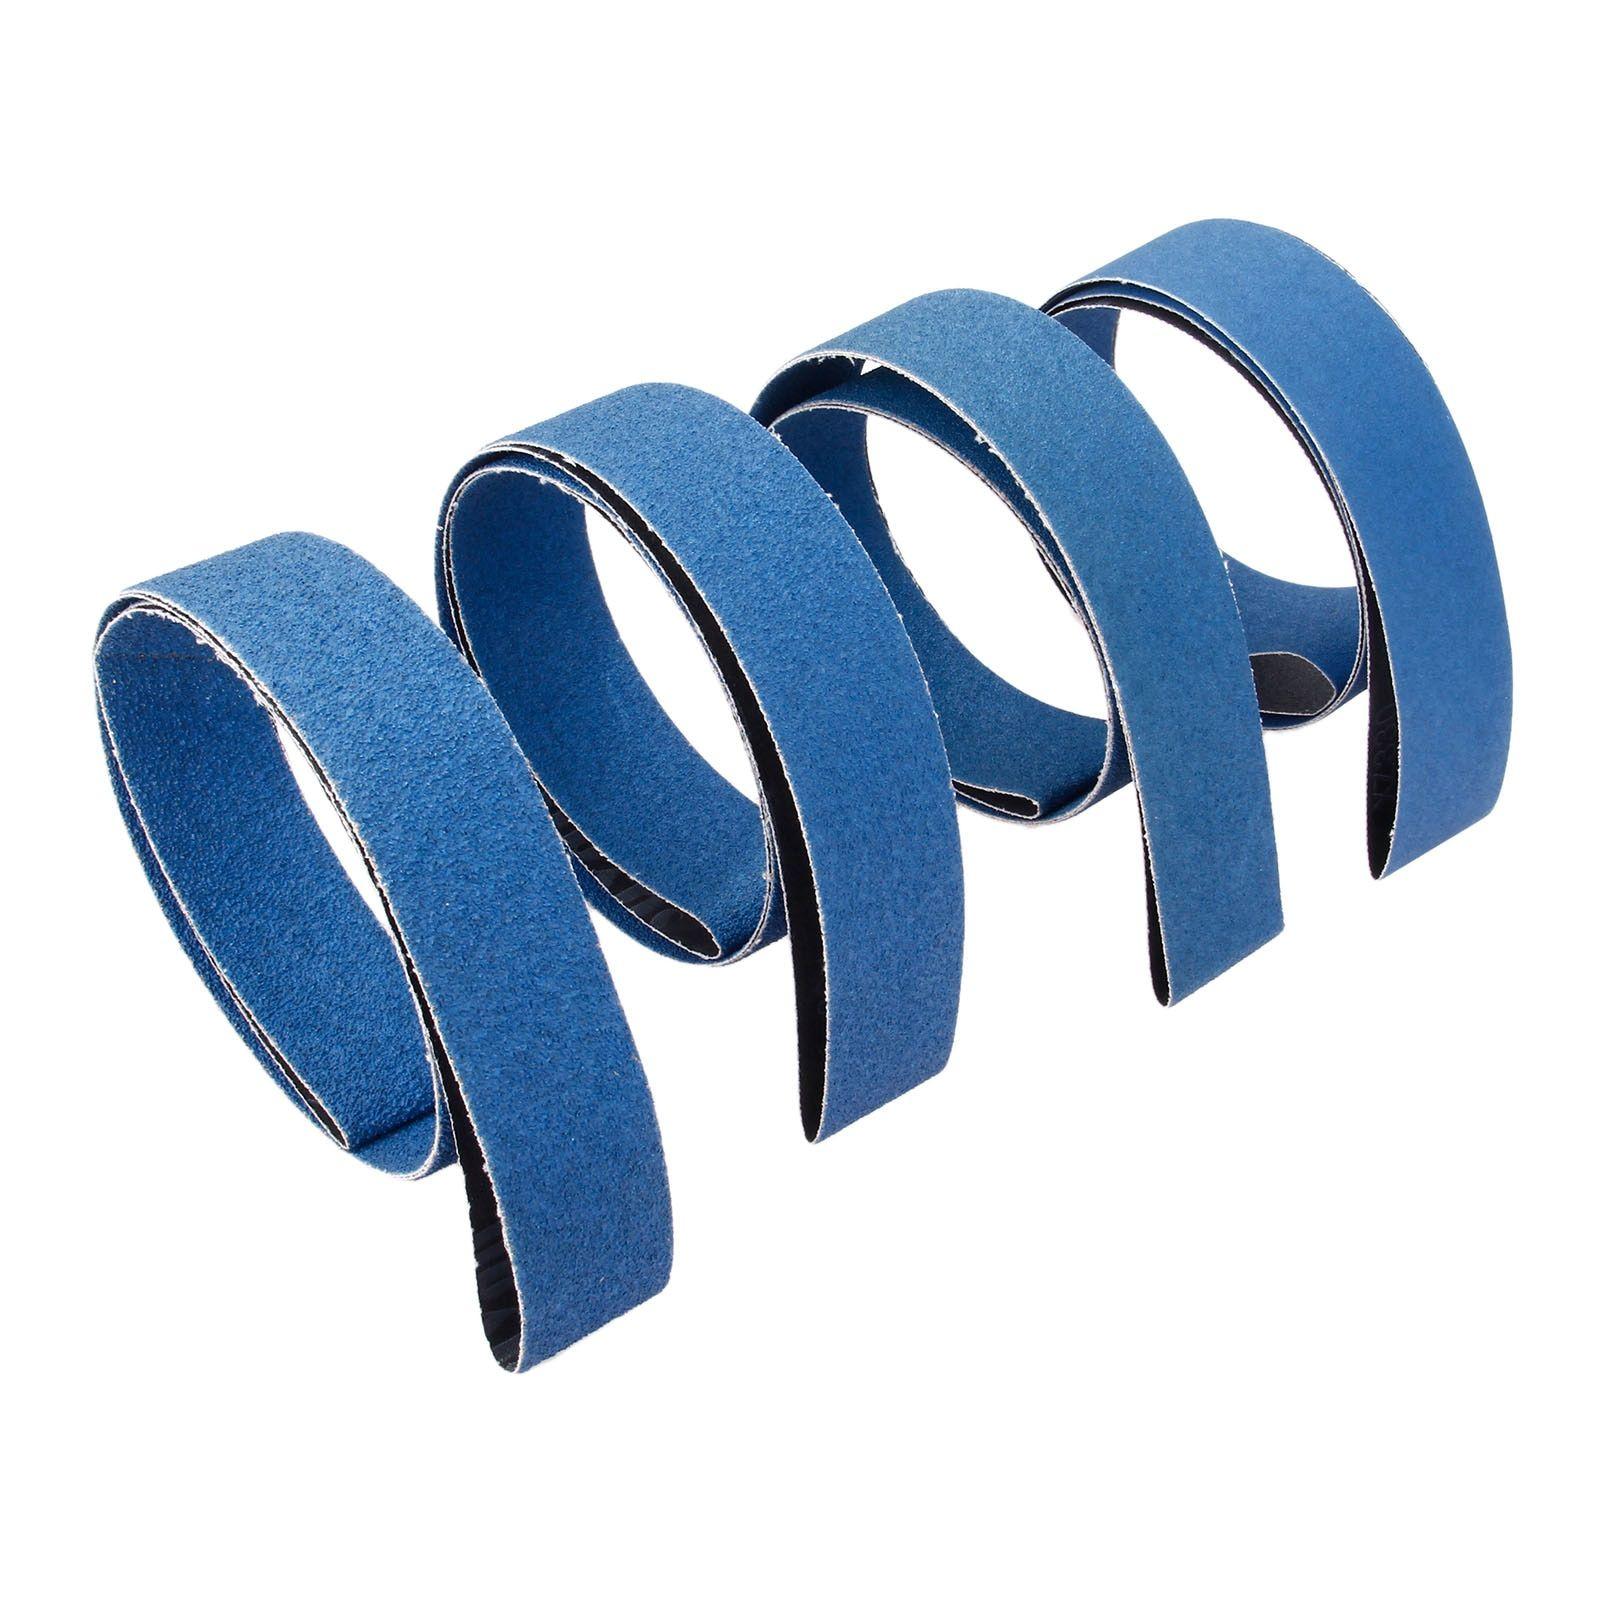 Abrasive Sanding 40pcs Paper Belts 13x457mm Grinding Polishing Sanders Belt Tool